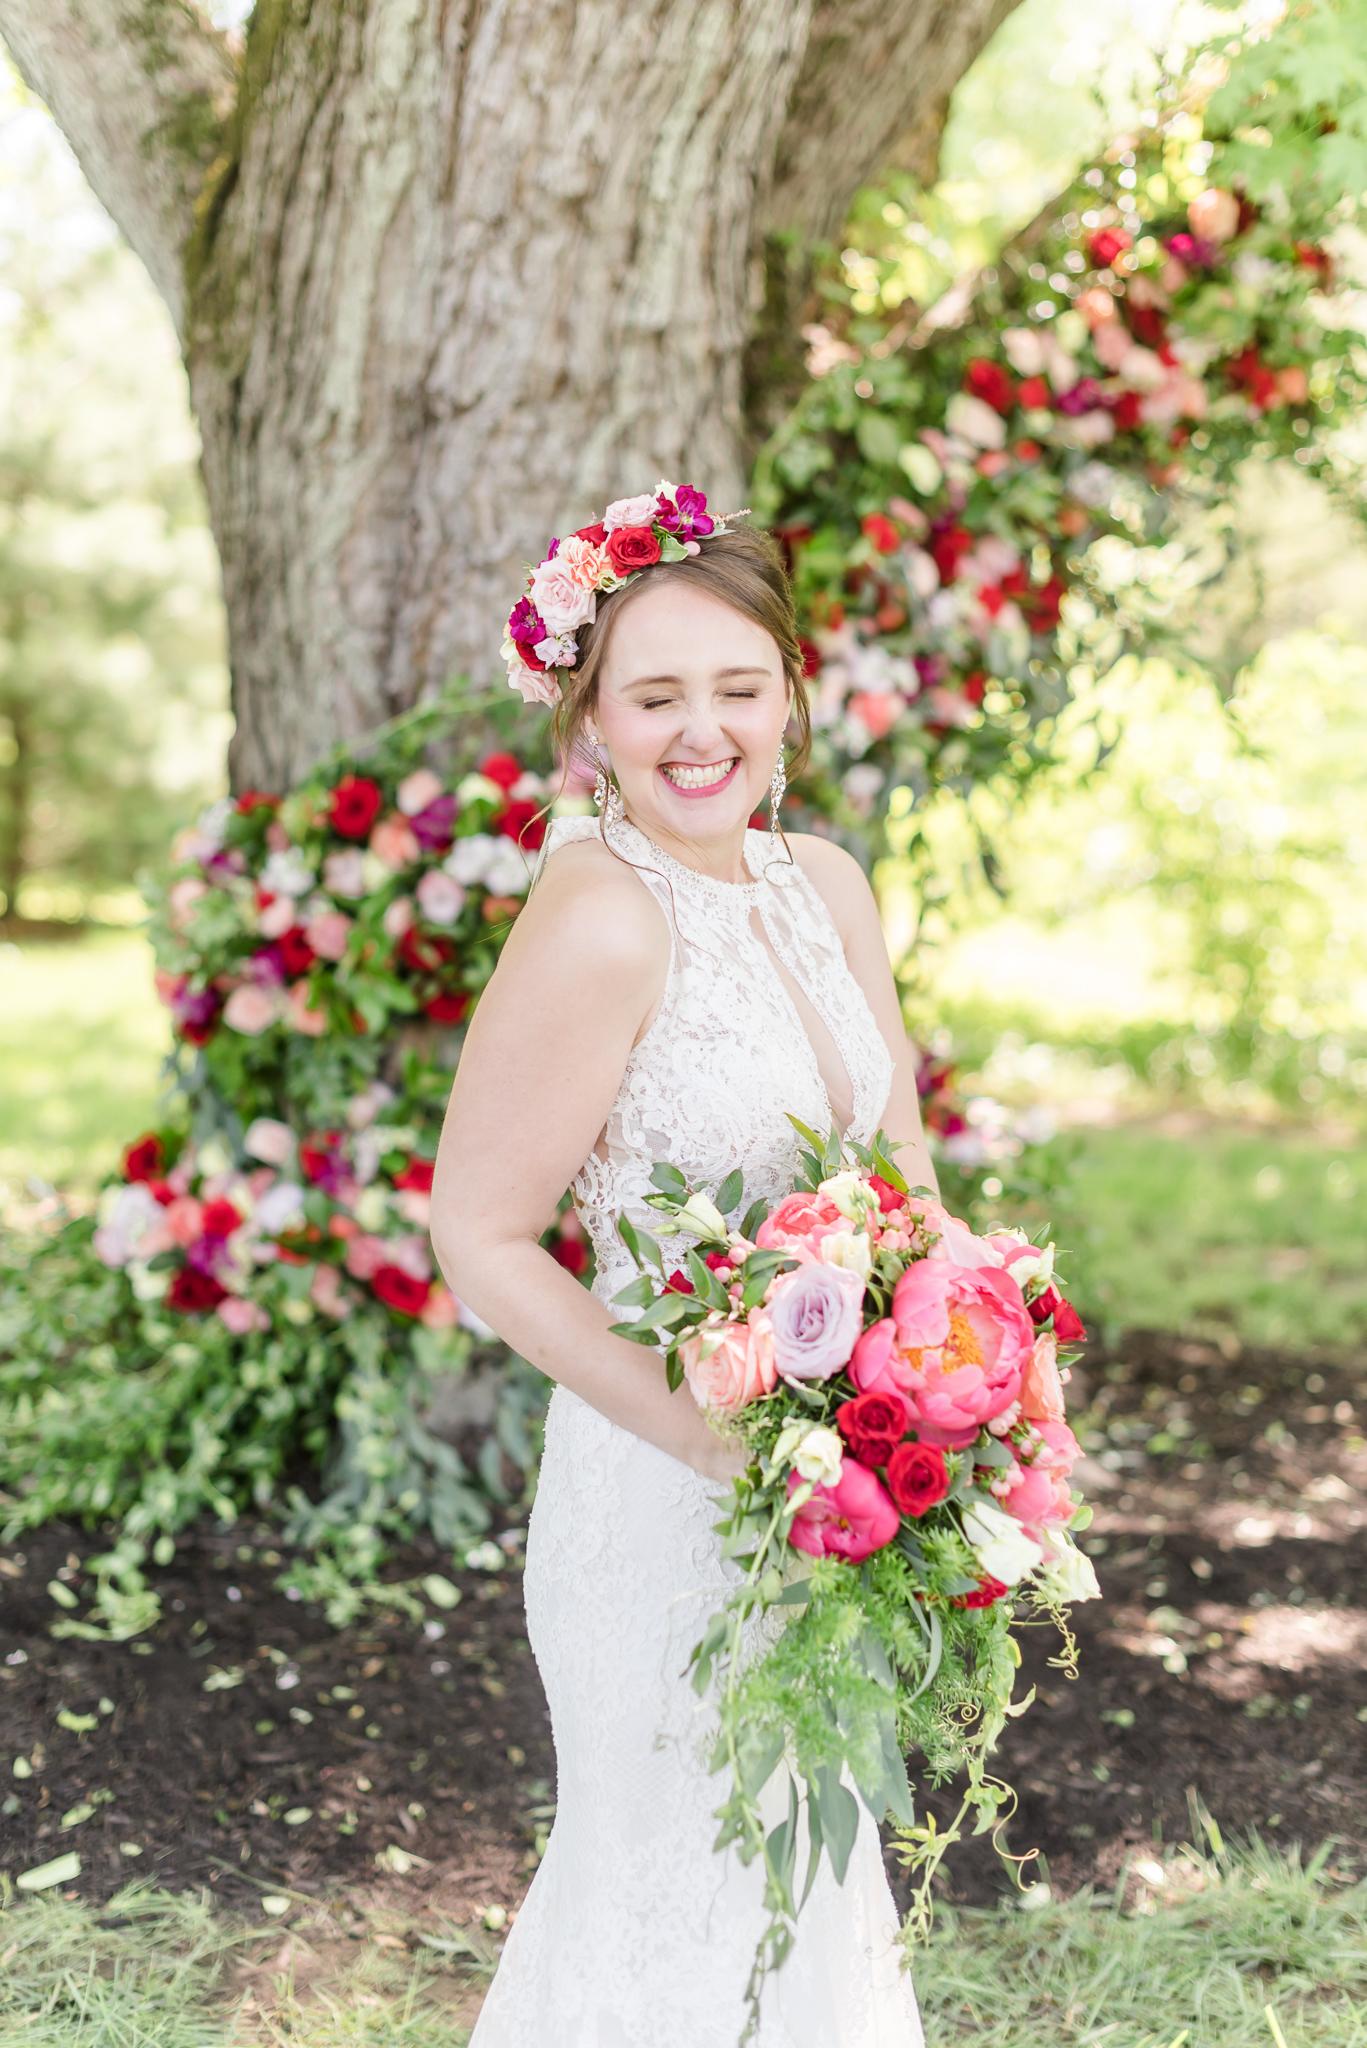 Mustard Seed Gardens Wedding Indianapolis Noblesvile Fishers Wedding Photographer-45.jpg